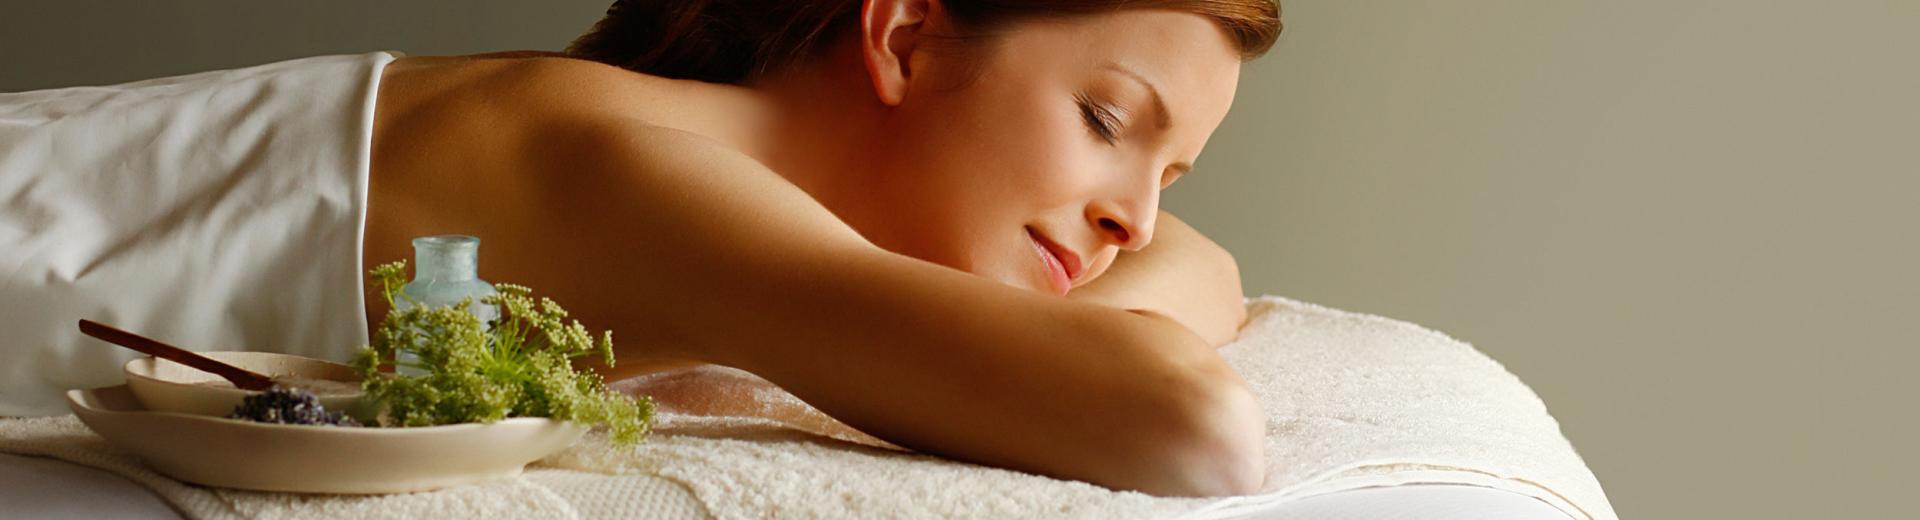 Hershey woman in spa